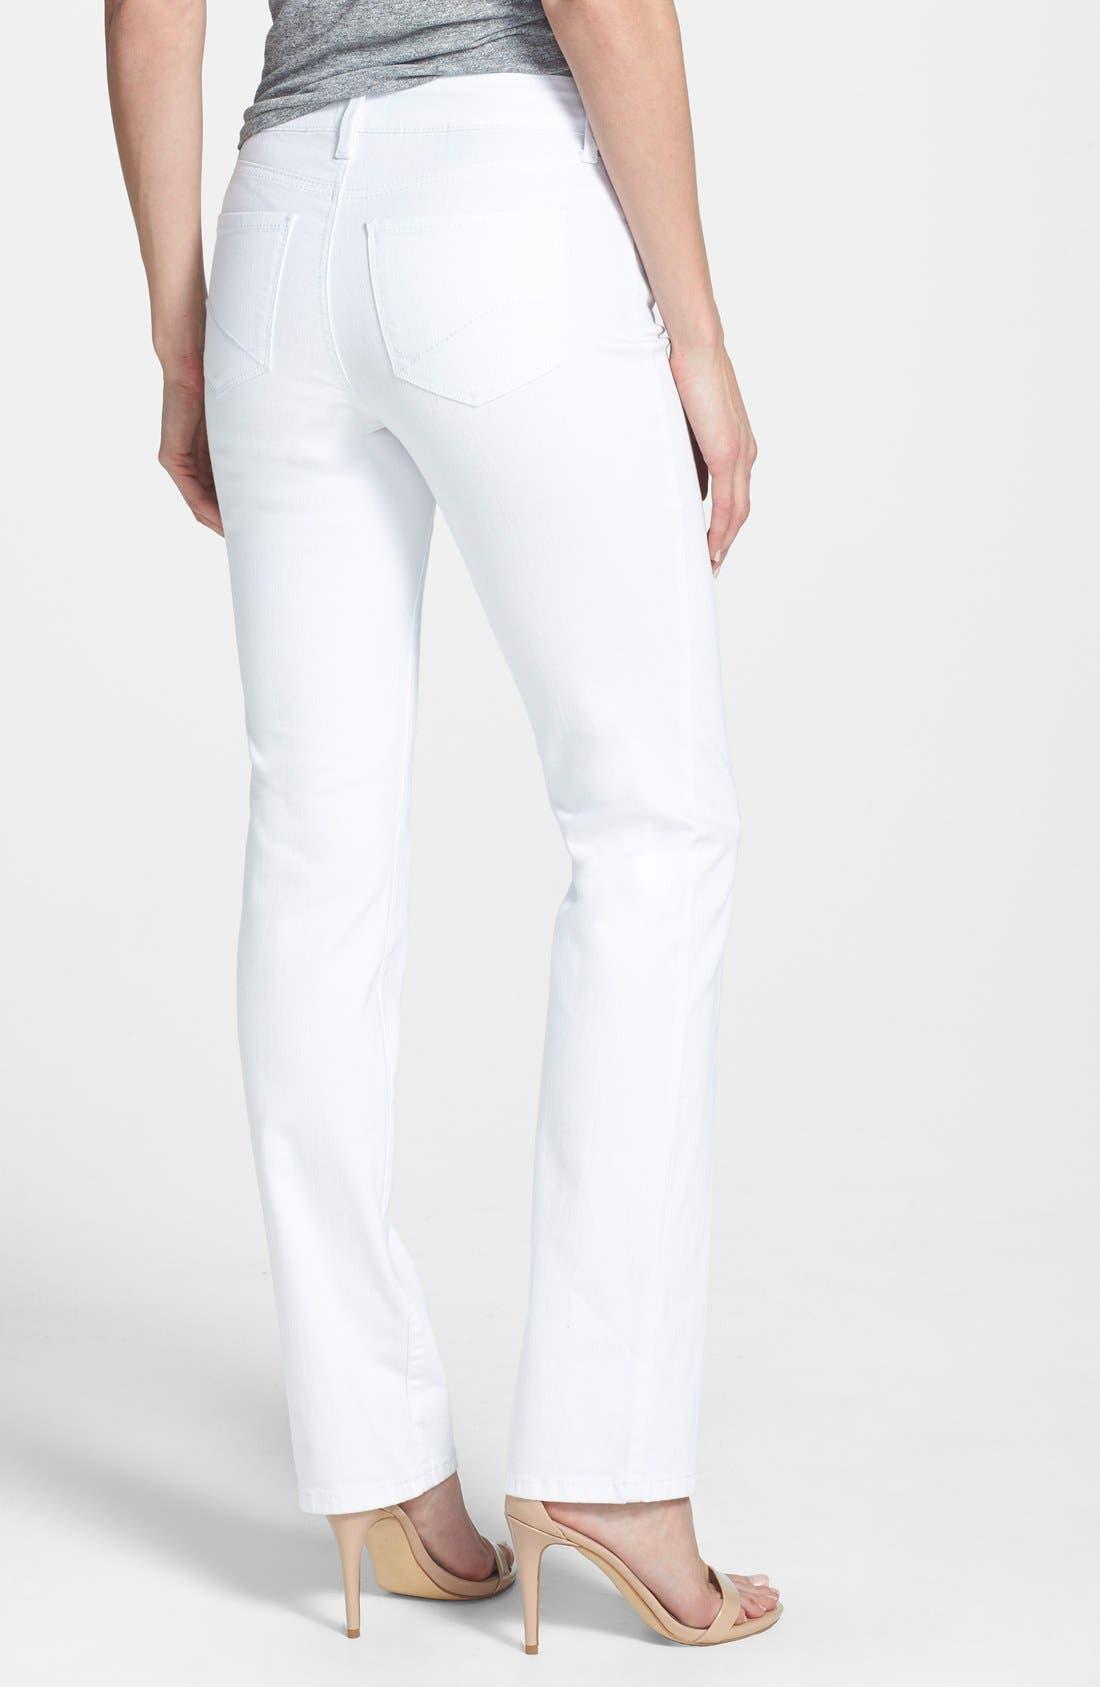 Alternate Image 2  - NYDJ 'Marilyn' Stretch Straight Leg Jeans (Optic White) (Regular & Petite)